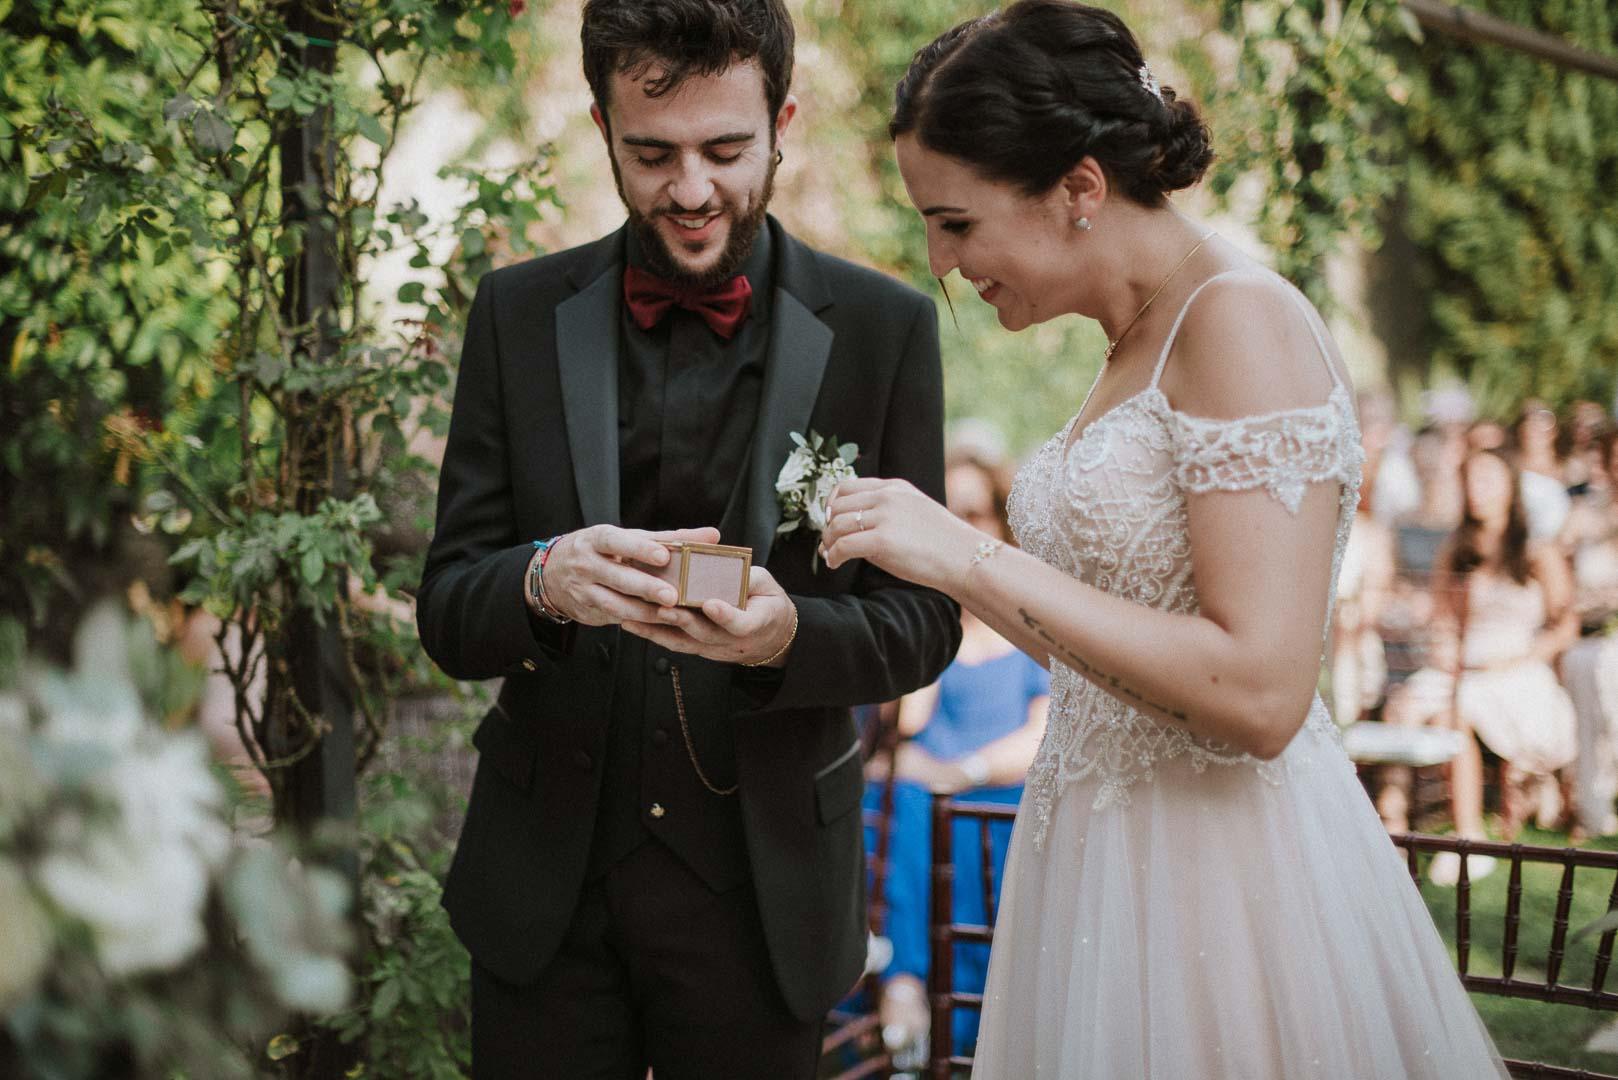 wedding-photographer-destination-fineart-bespoke-reportage-tuscany-villascorzi-vivianeizzo-spazio46-71